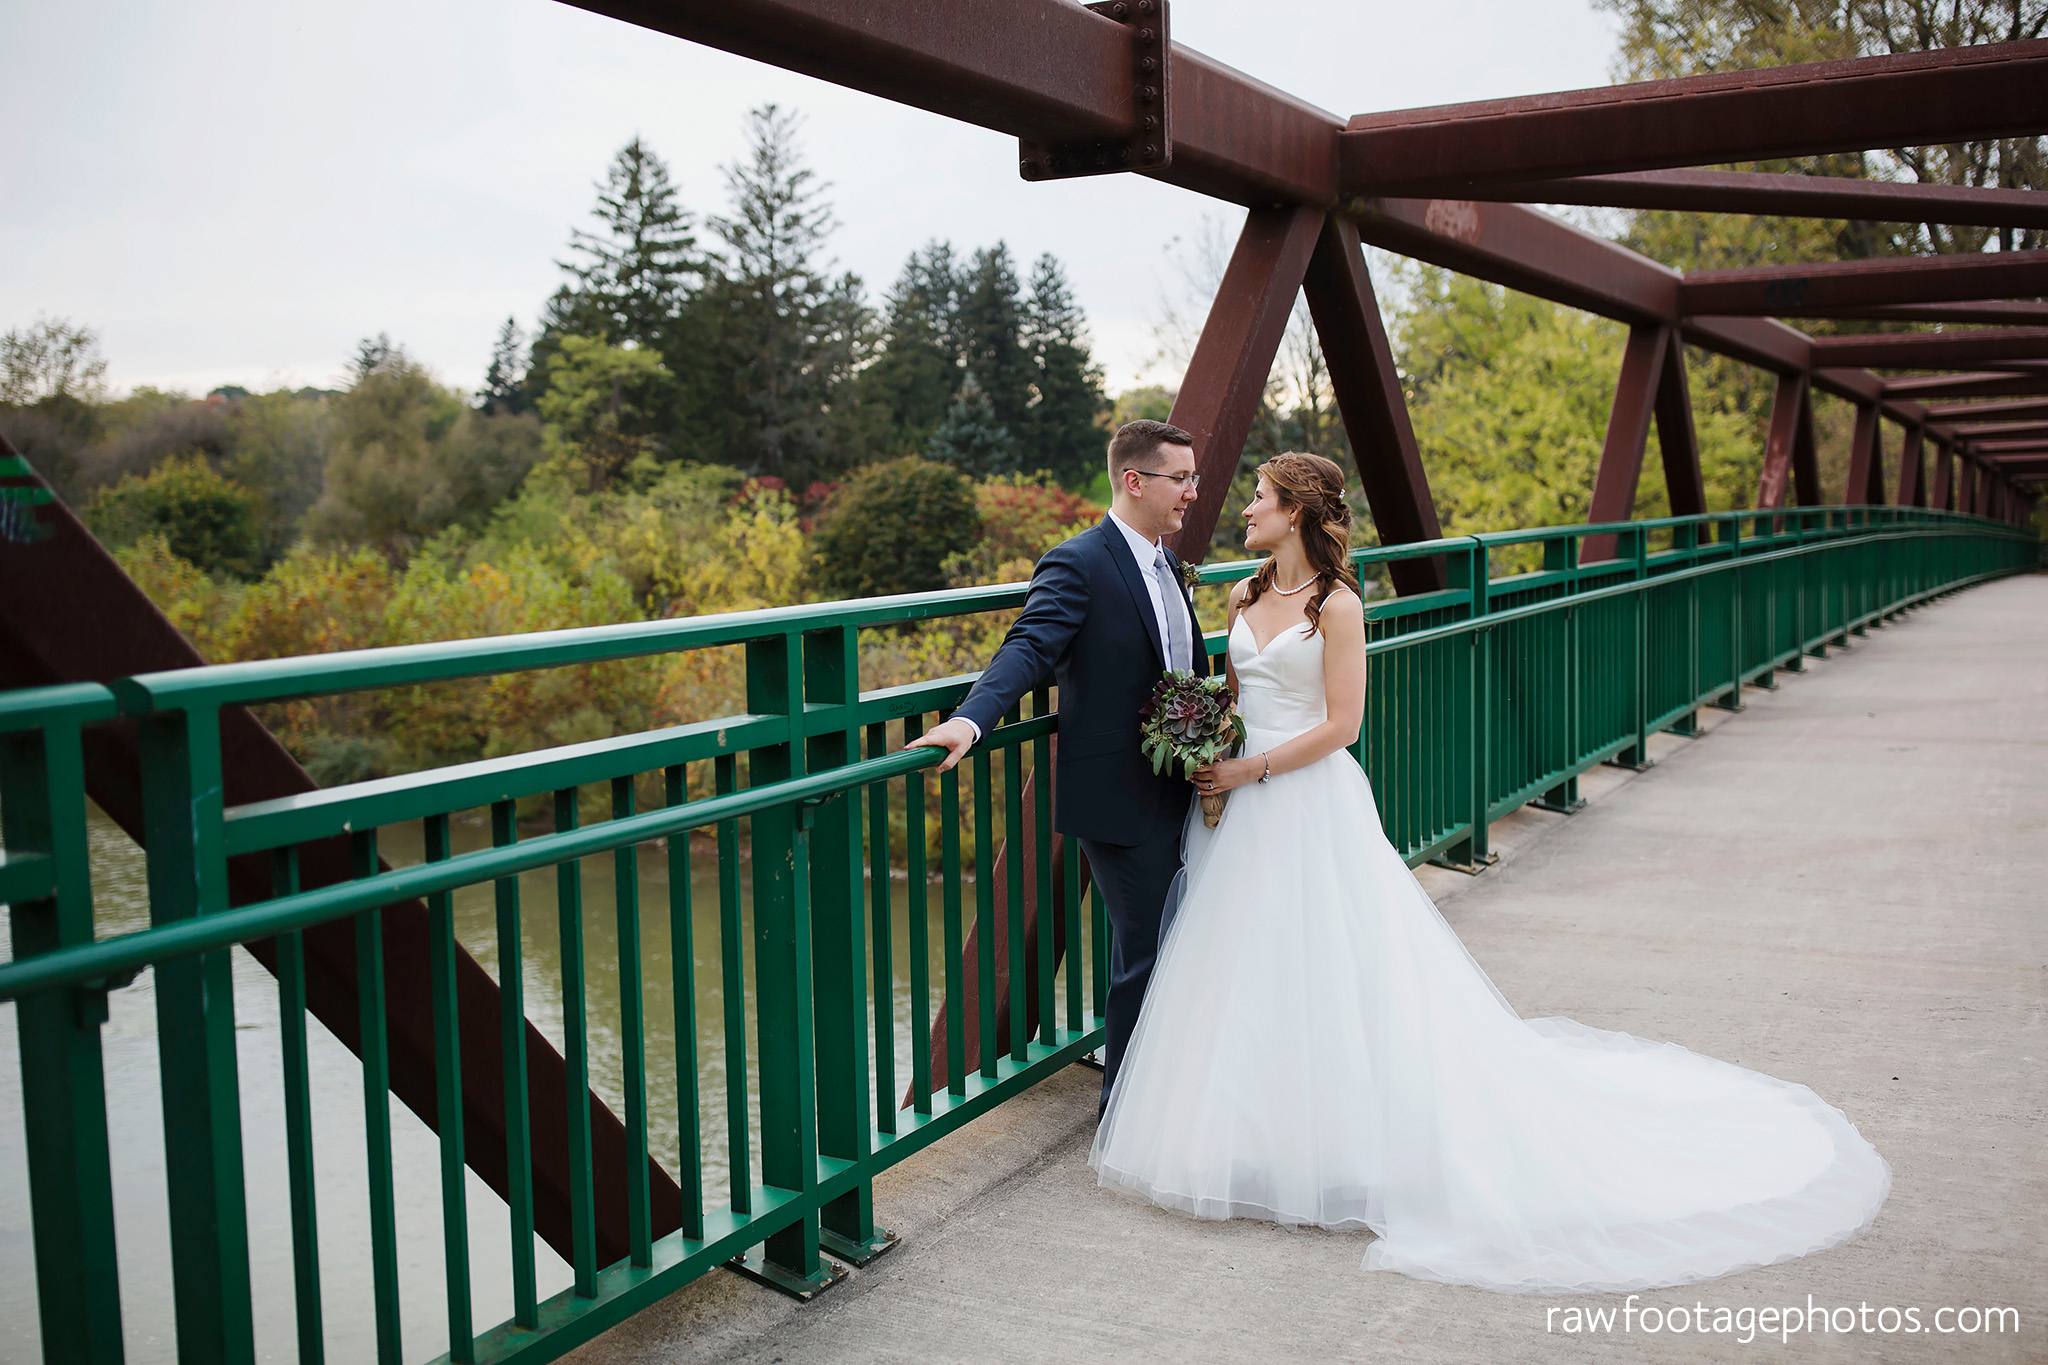 london_ontario_wedding_photographer-civic_gardens-springbank_park-succulent_bouquet-fall_wedding-bridge-raw_footage_photography065.jpg